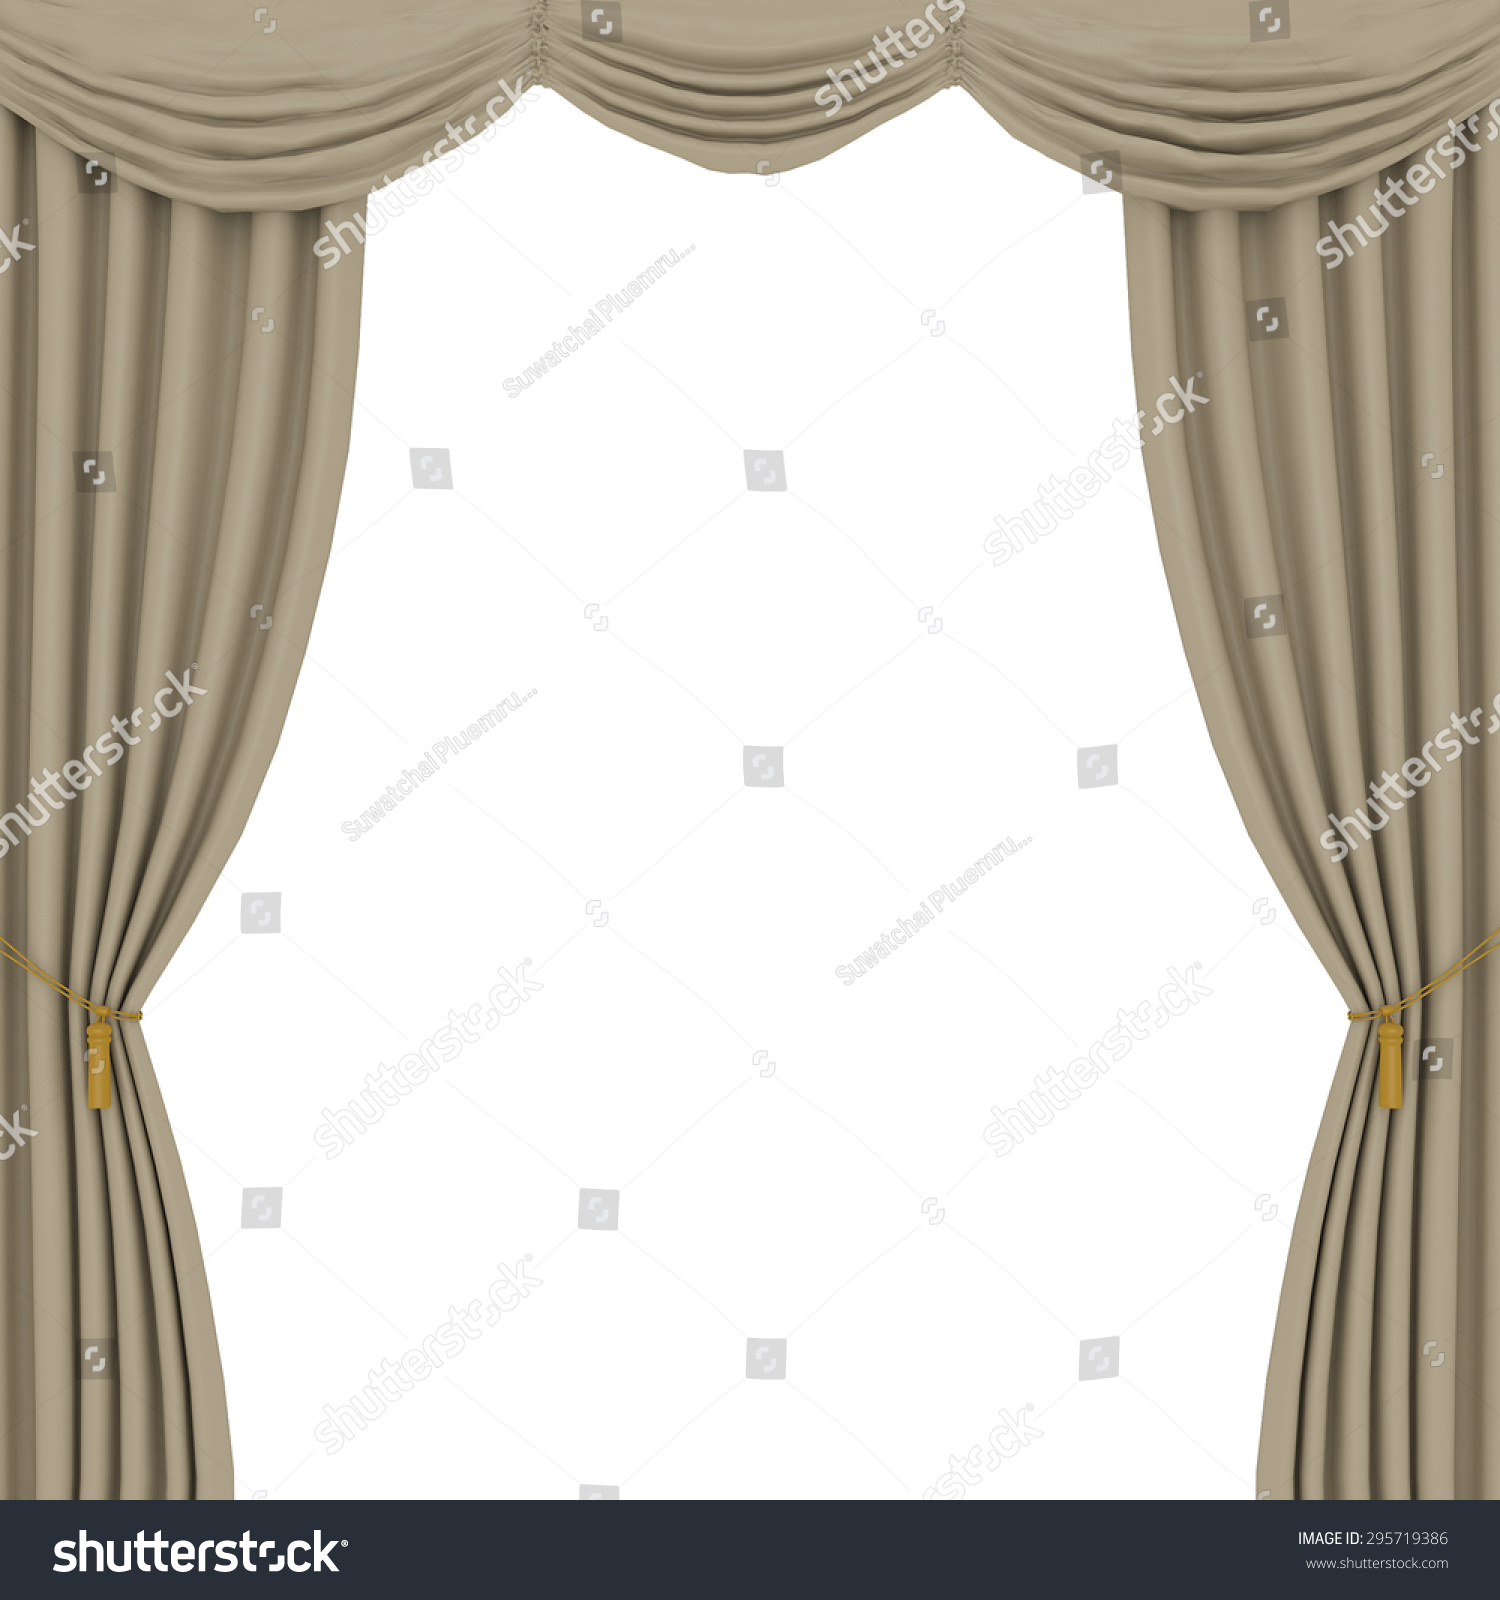 Light brown curtains - Light Brown Curtains On White Background